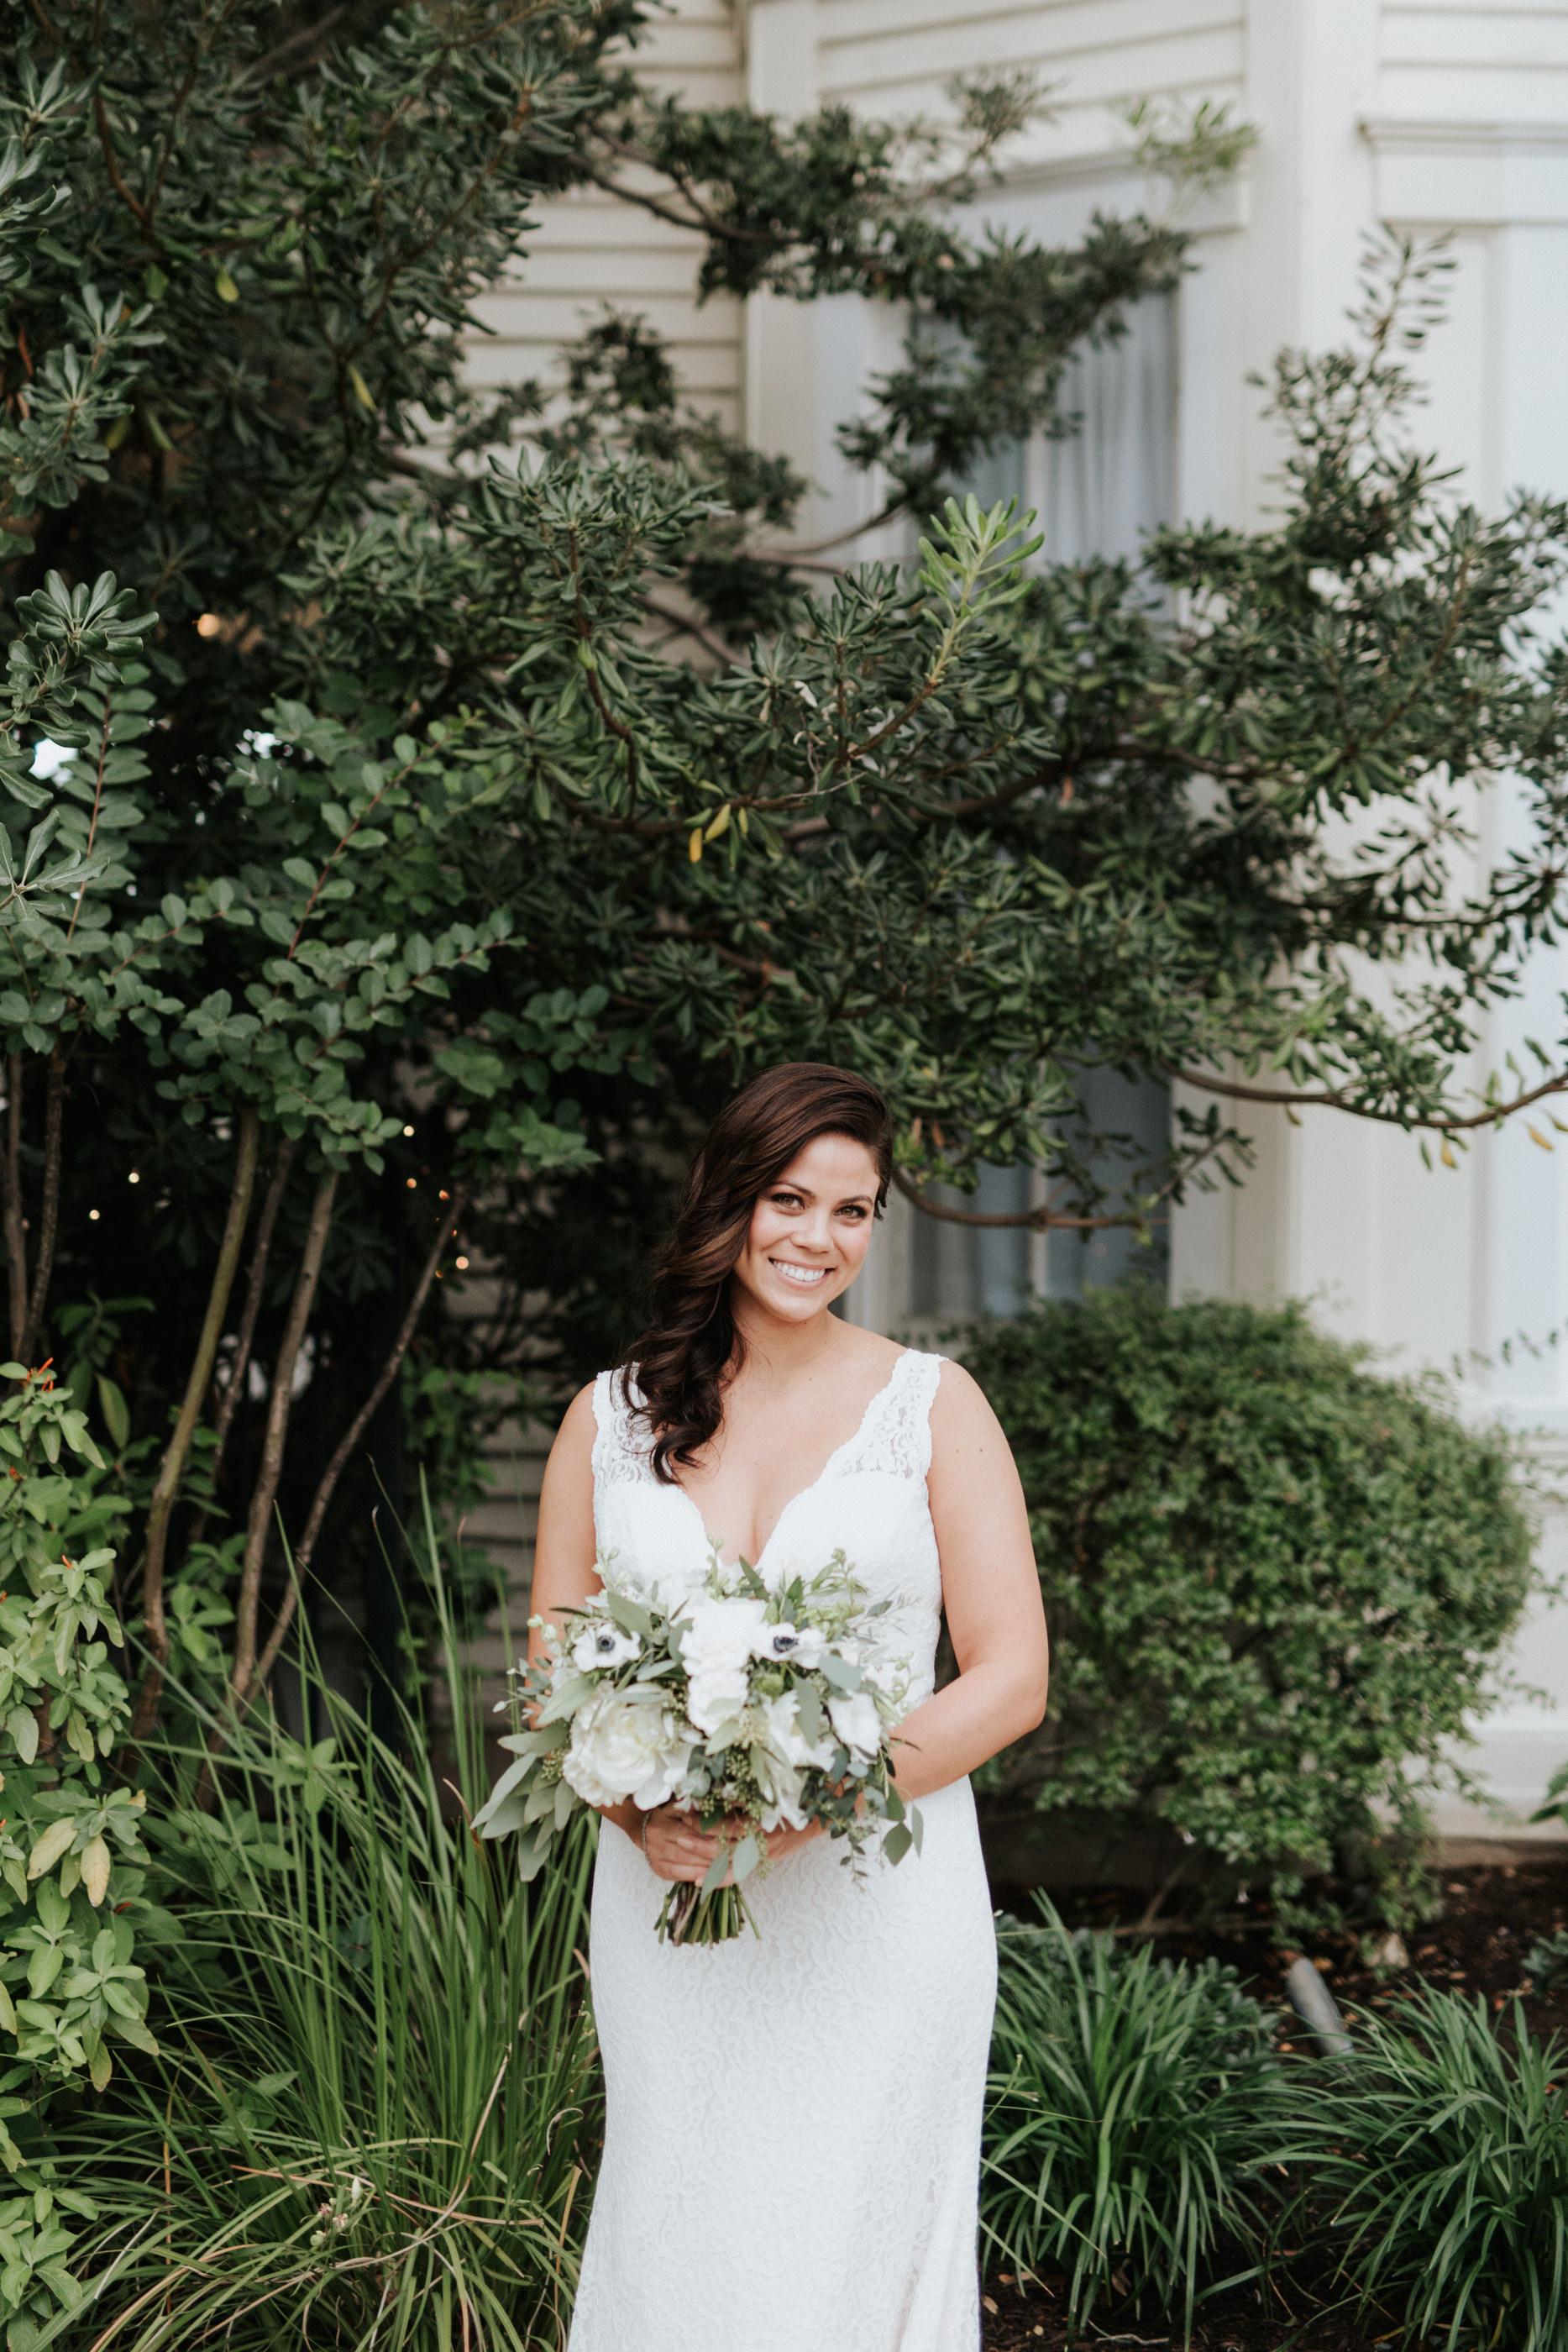 Ginny + Mando Wedding - Diana Ascarrunz Photography-392.JPG